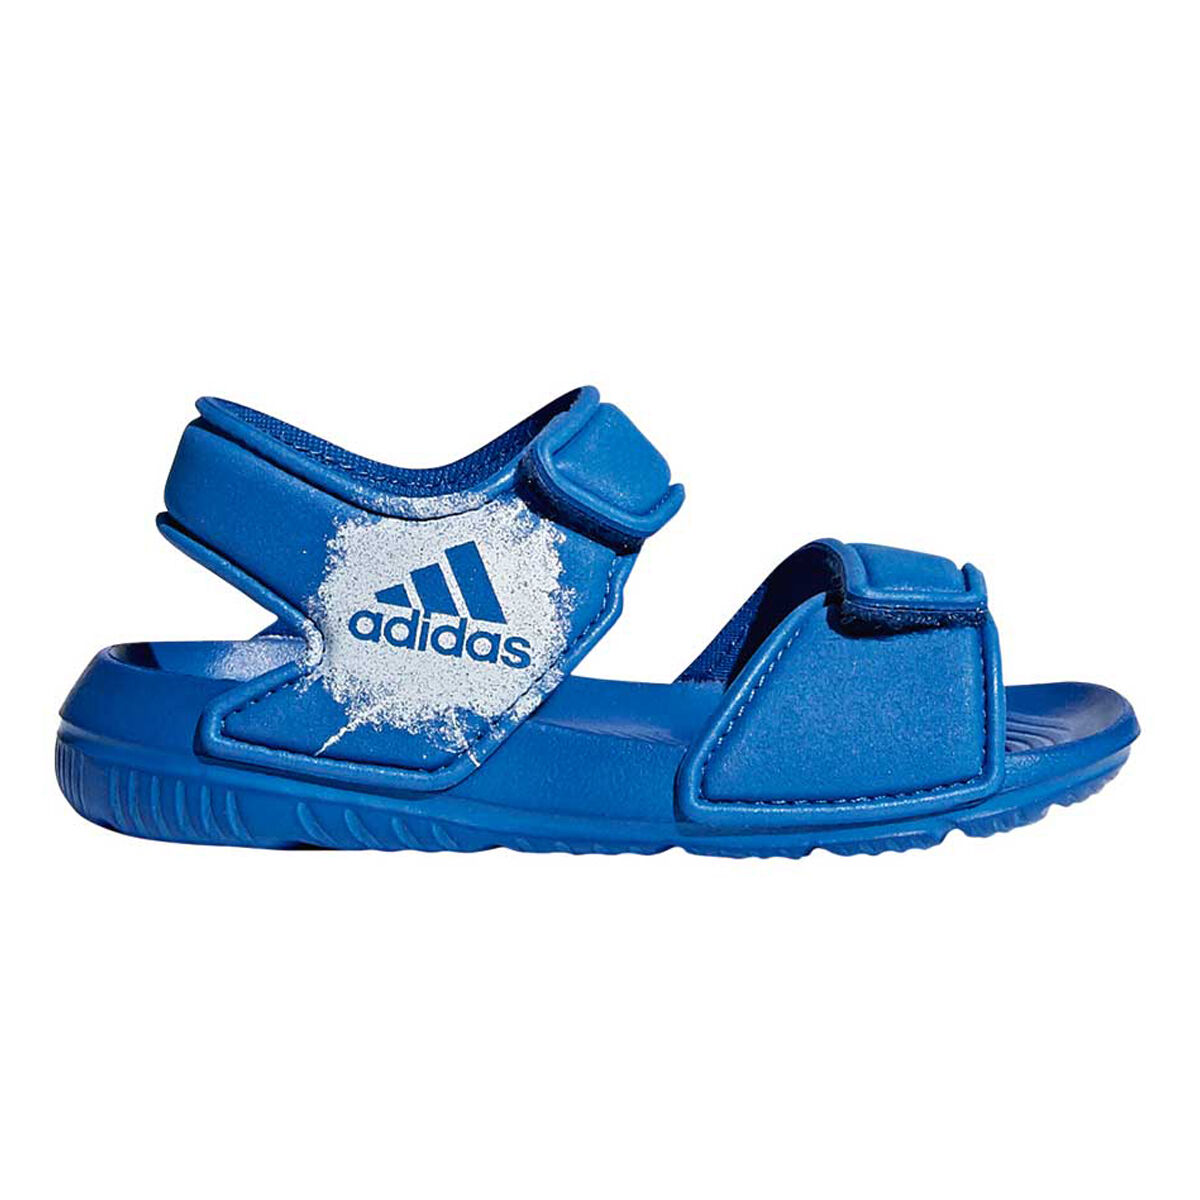 adidas Altaswim Toddlers Shoes